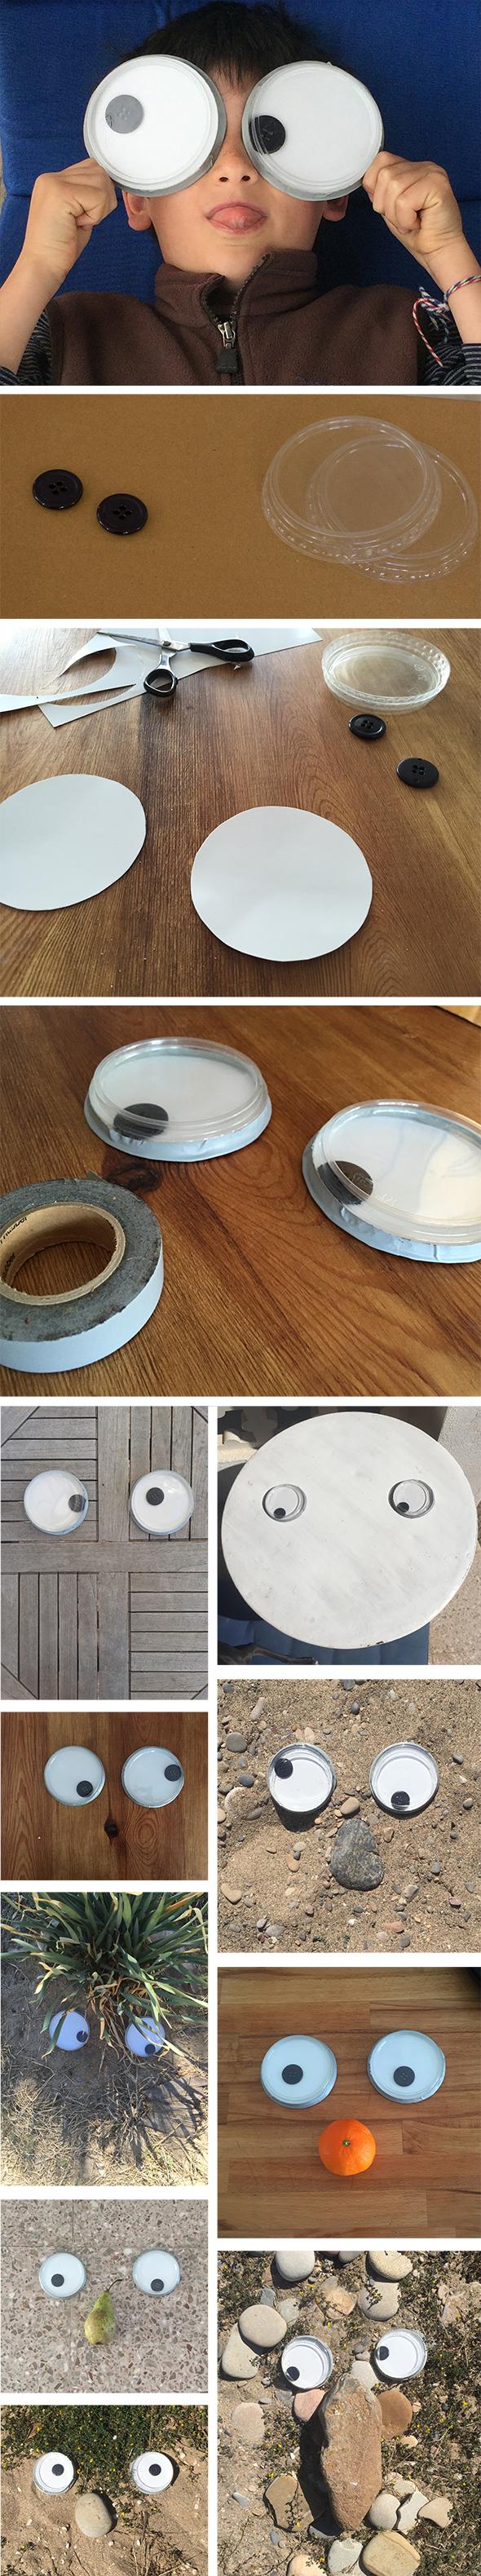 wackelaugen movingeyes ojo manualidad craft basteln kinder niños kids children